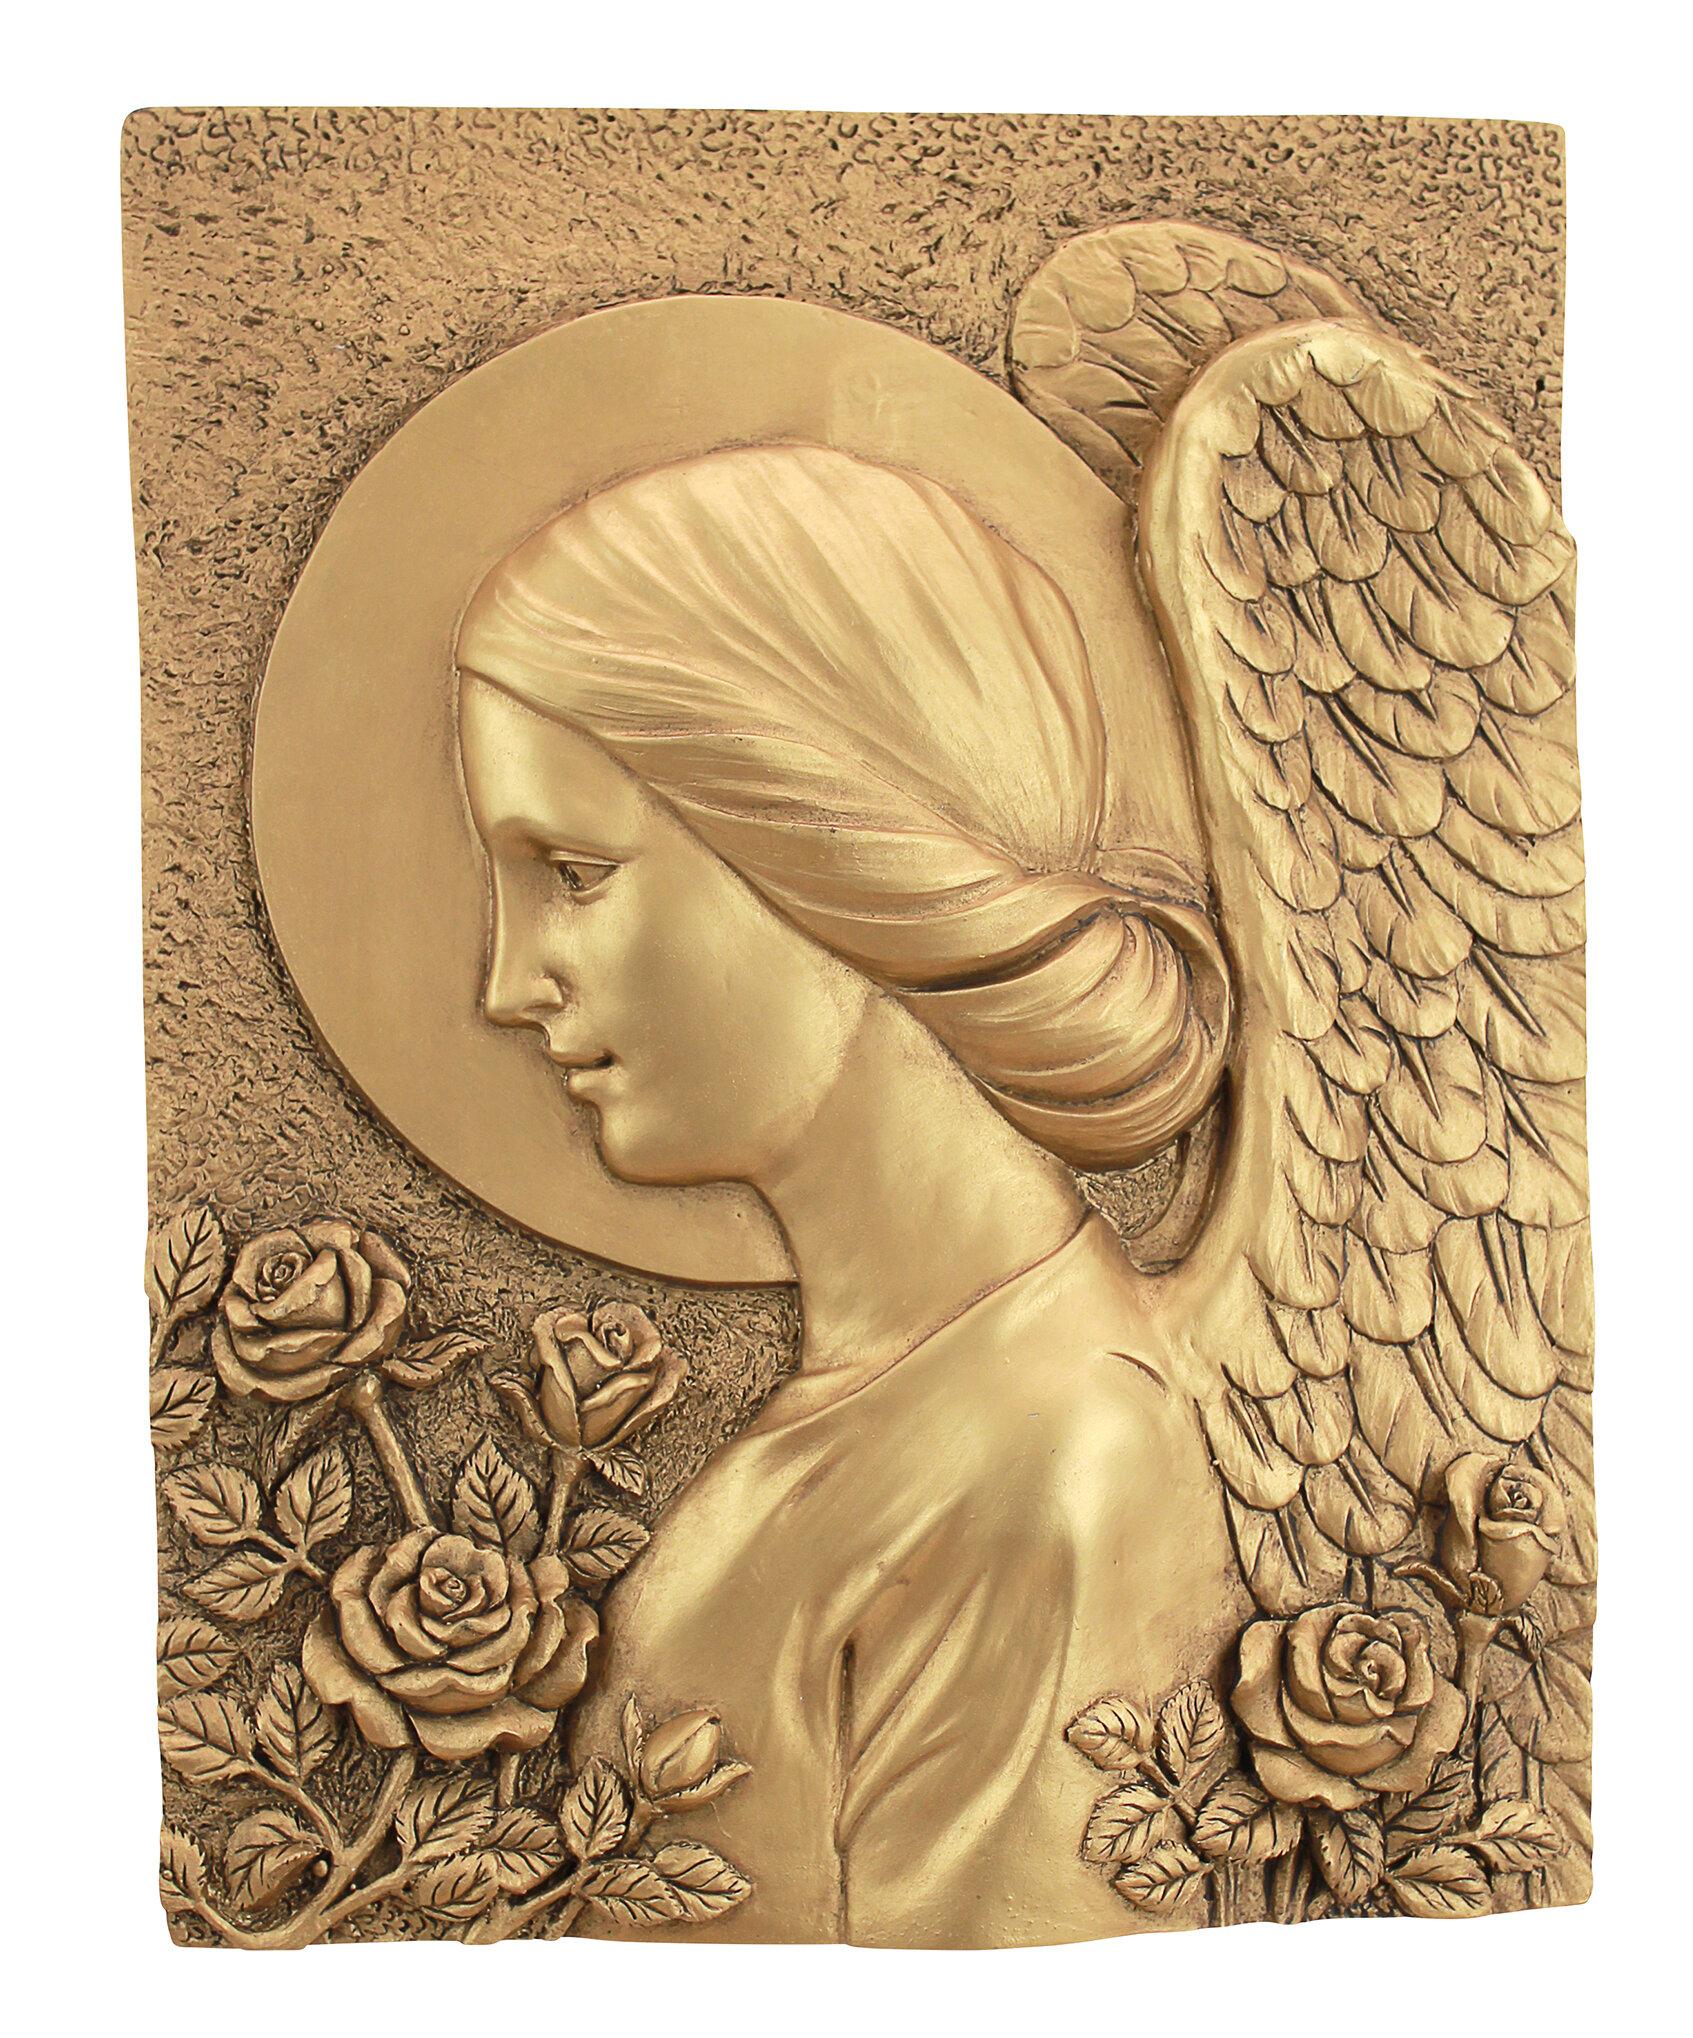 Design Toscano Barachiel the Archangel of Blessings Wall Décor | Wayfair